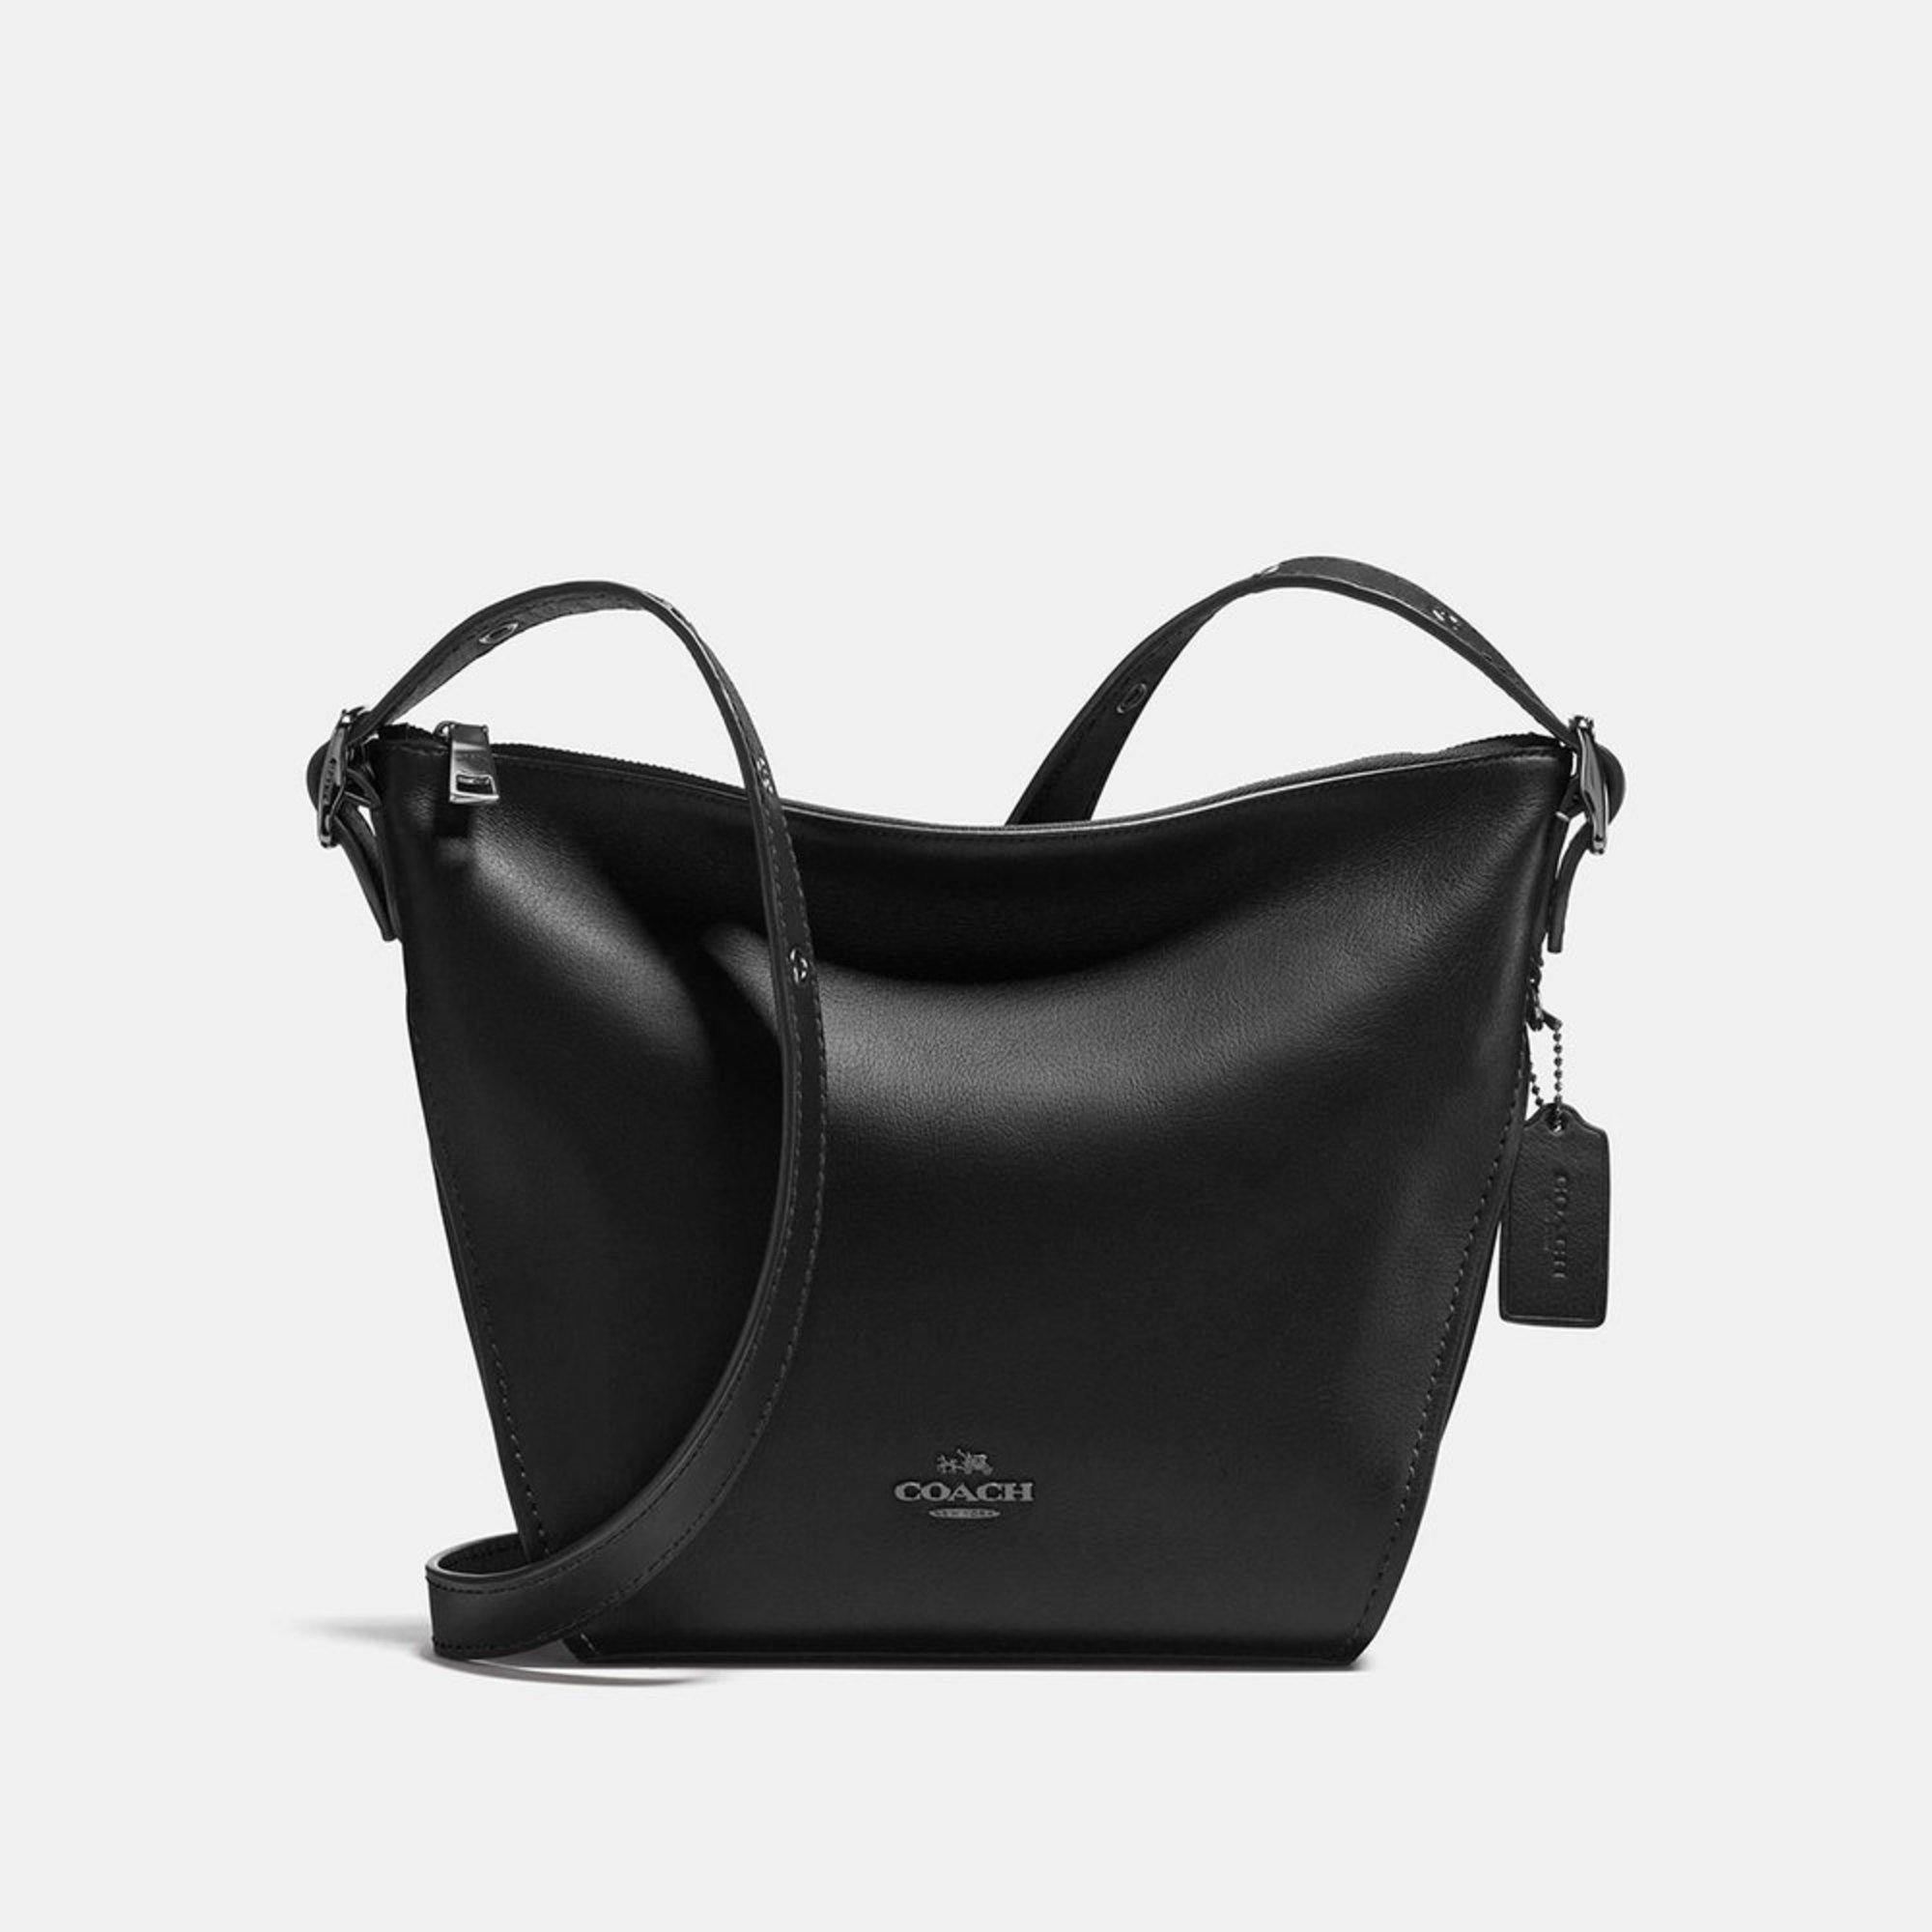 764515299d87 Coach Natural Leather Small Dufflette Black